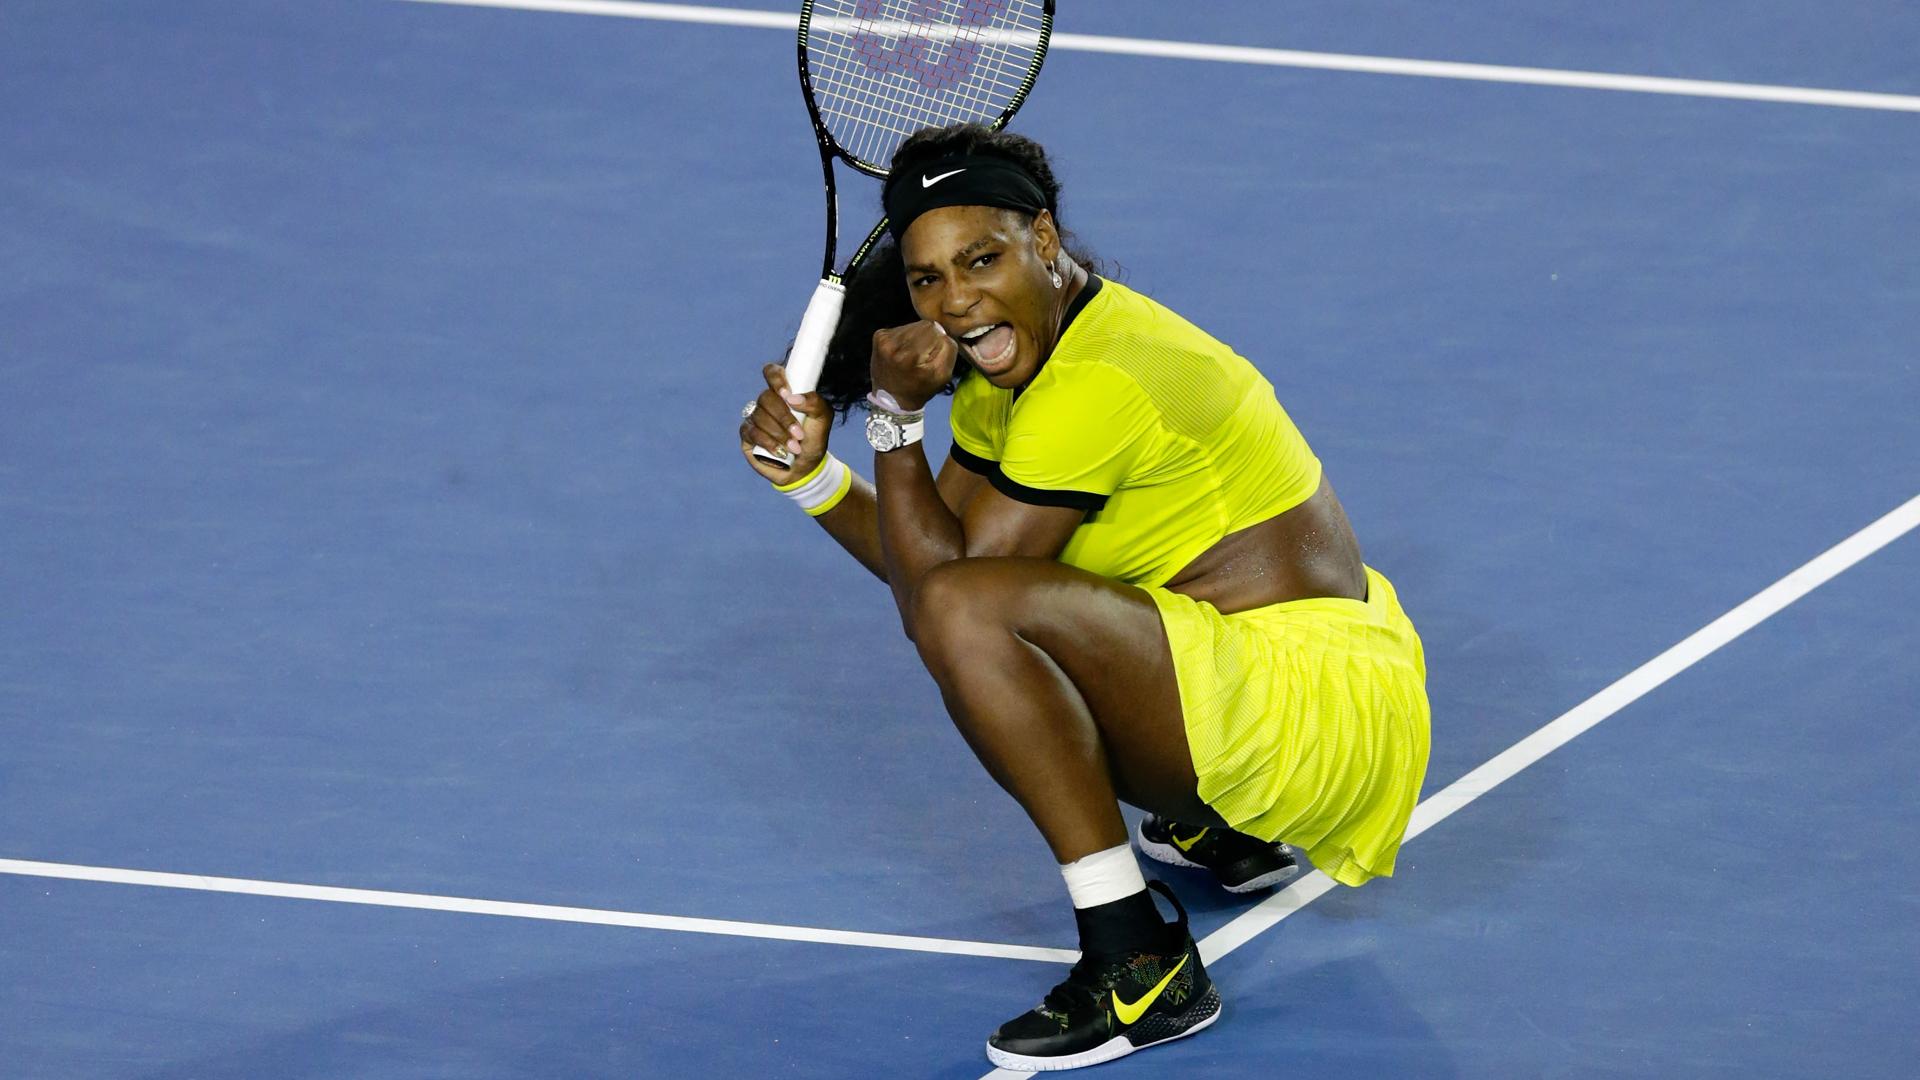 Williams Serena Tennis Explorer Serenawilliams Cropped Ygvvyvwzzdisqwayop